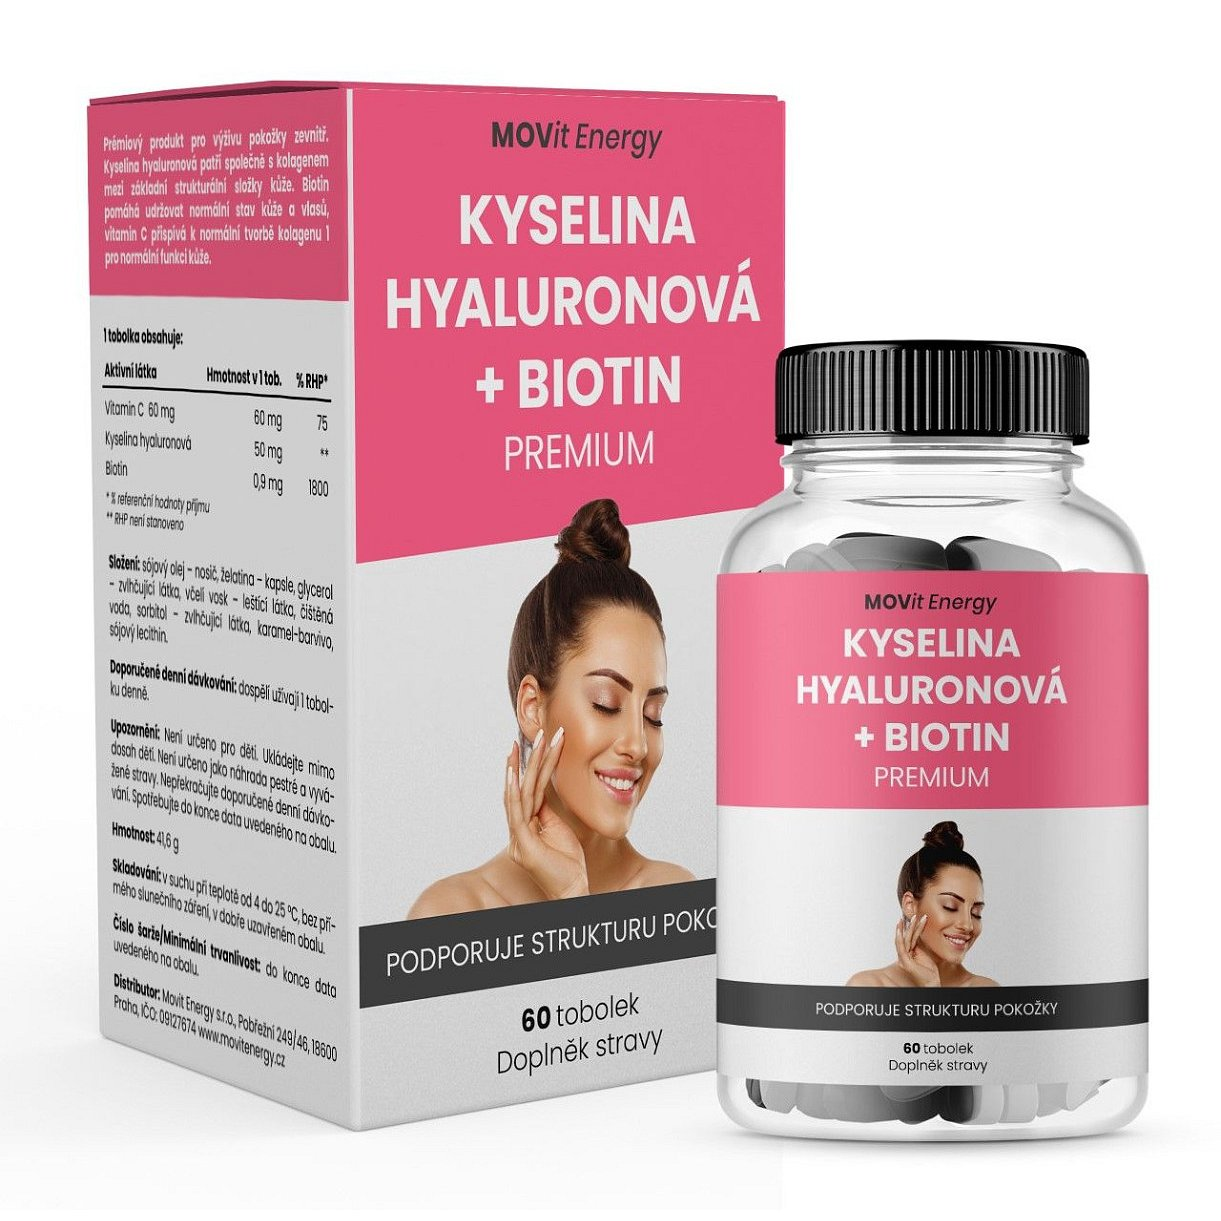 MOVit Energy Kyselina hyaluronová + Biotin PREMIUM 60 tobolek